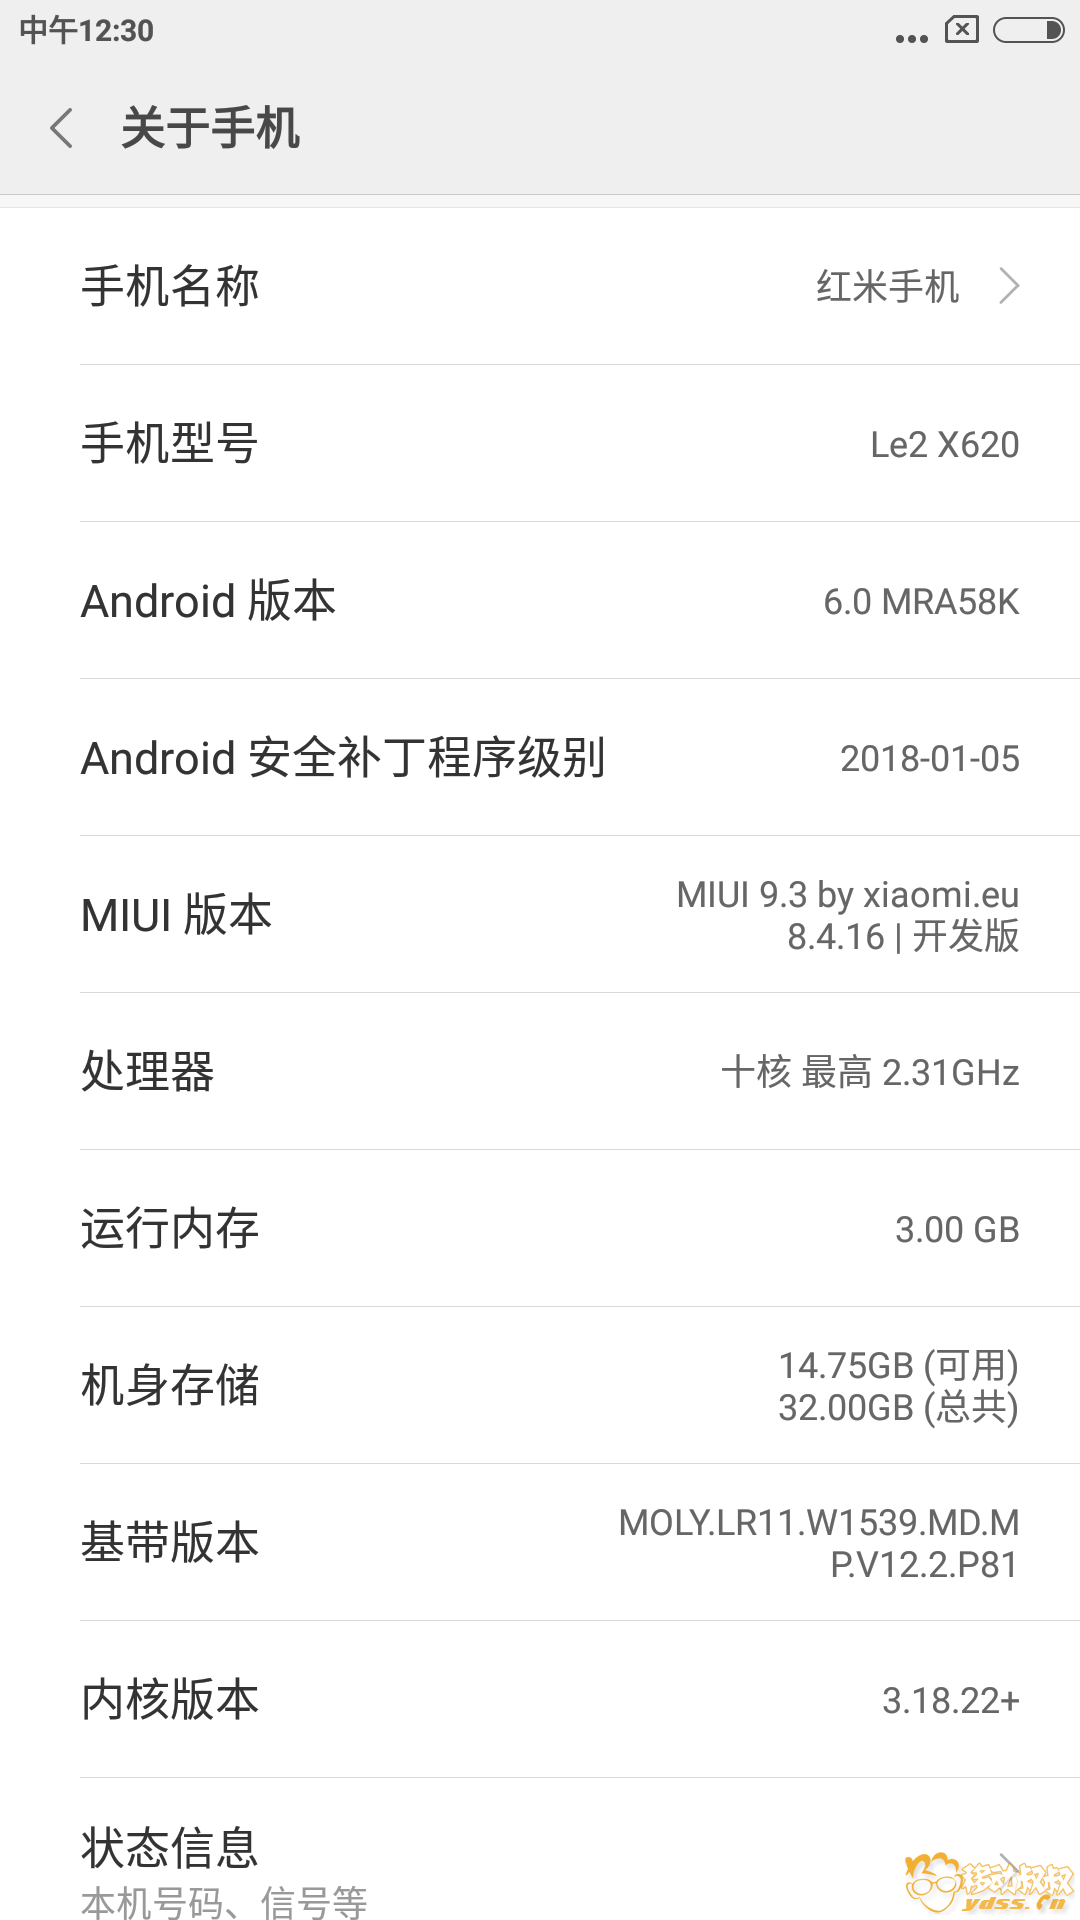 Screenshot_2018-04-16-12-30-46-686_com.android.settings.png